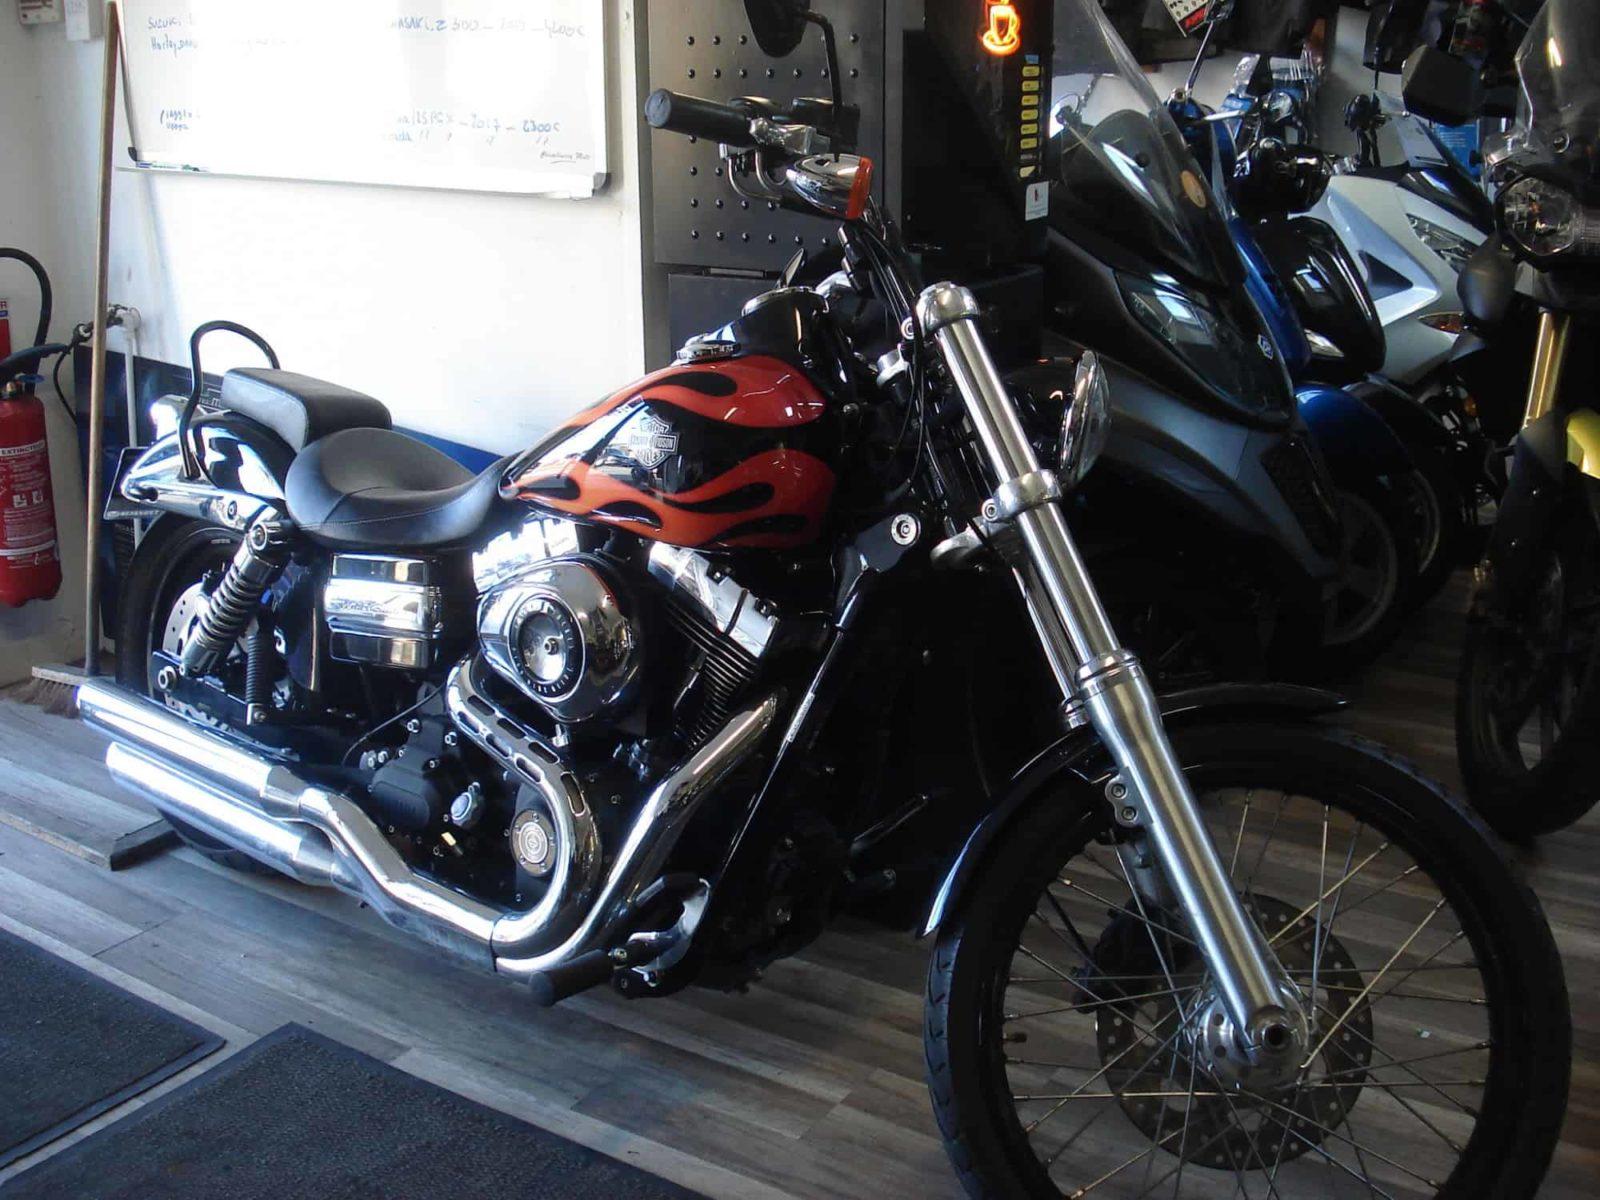 Vendu ! Harley-Davidson Dyna Wide Glide – 12000€